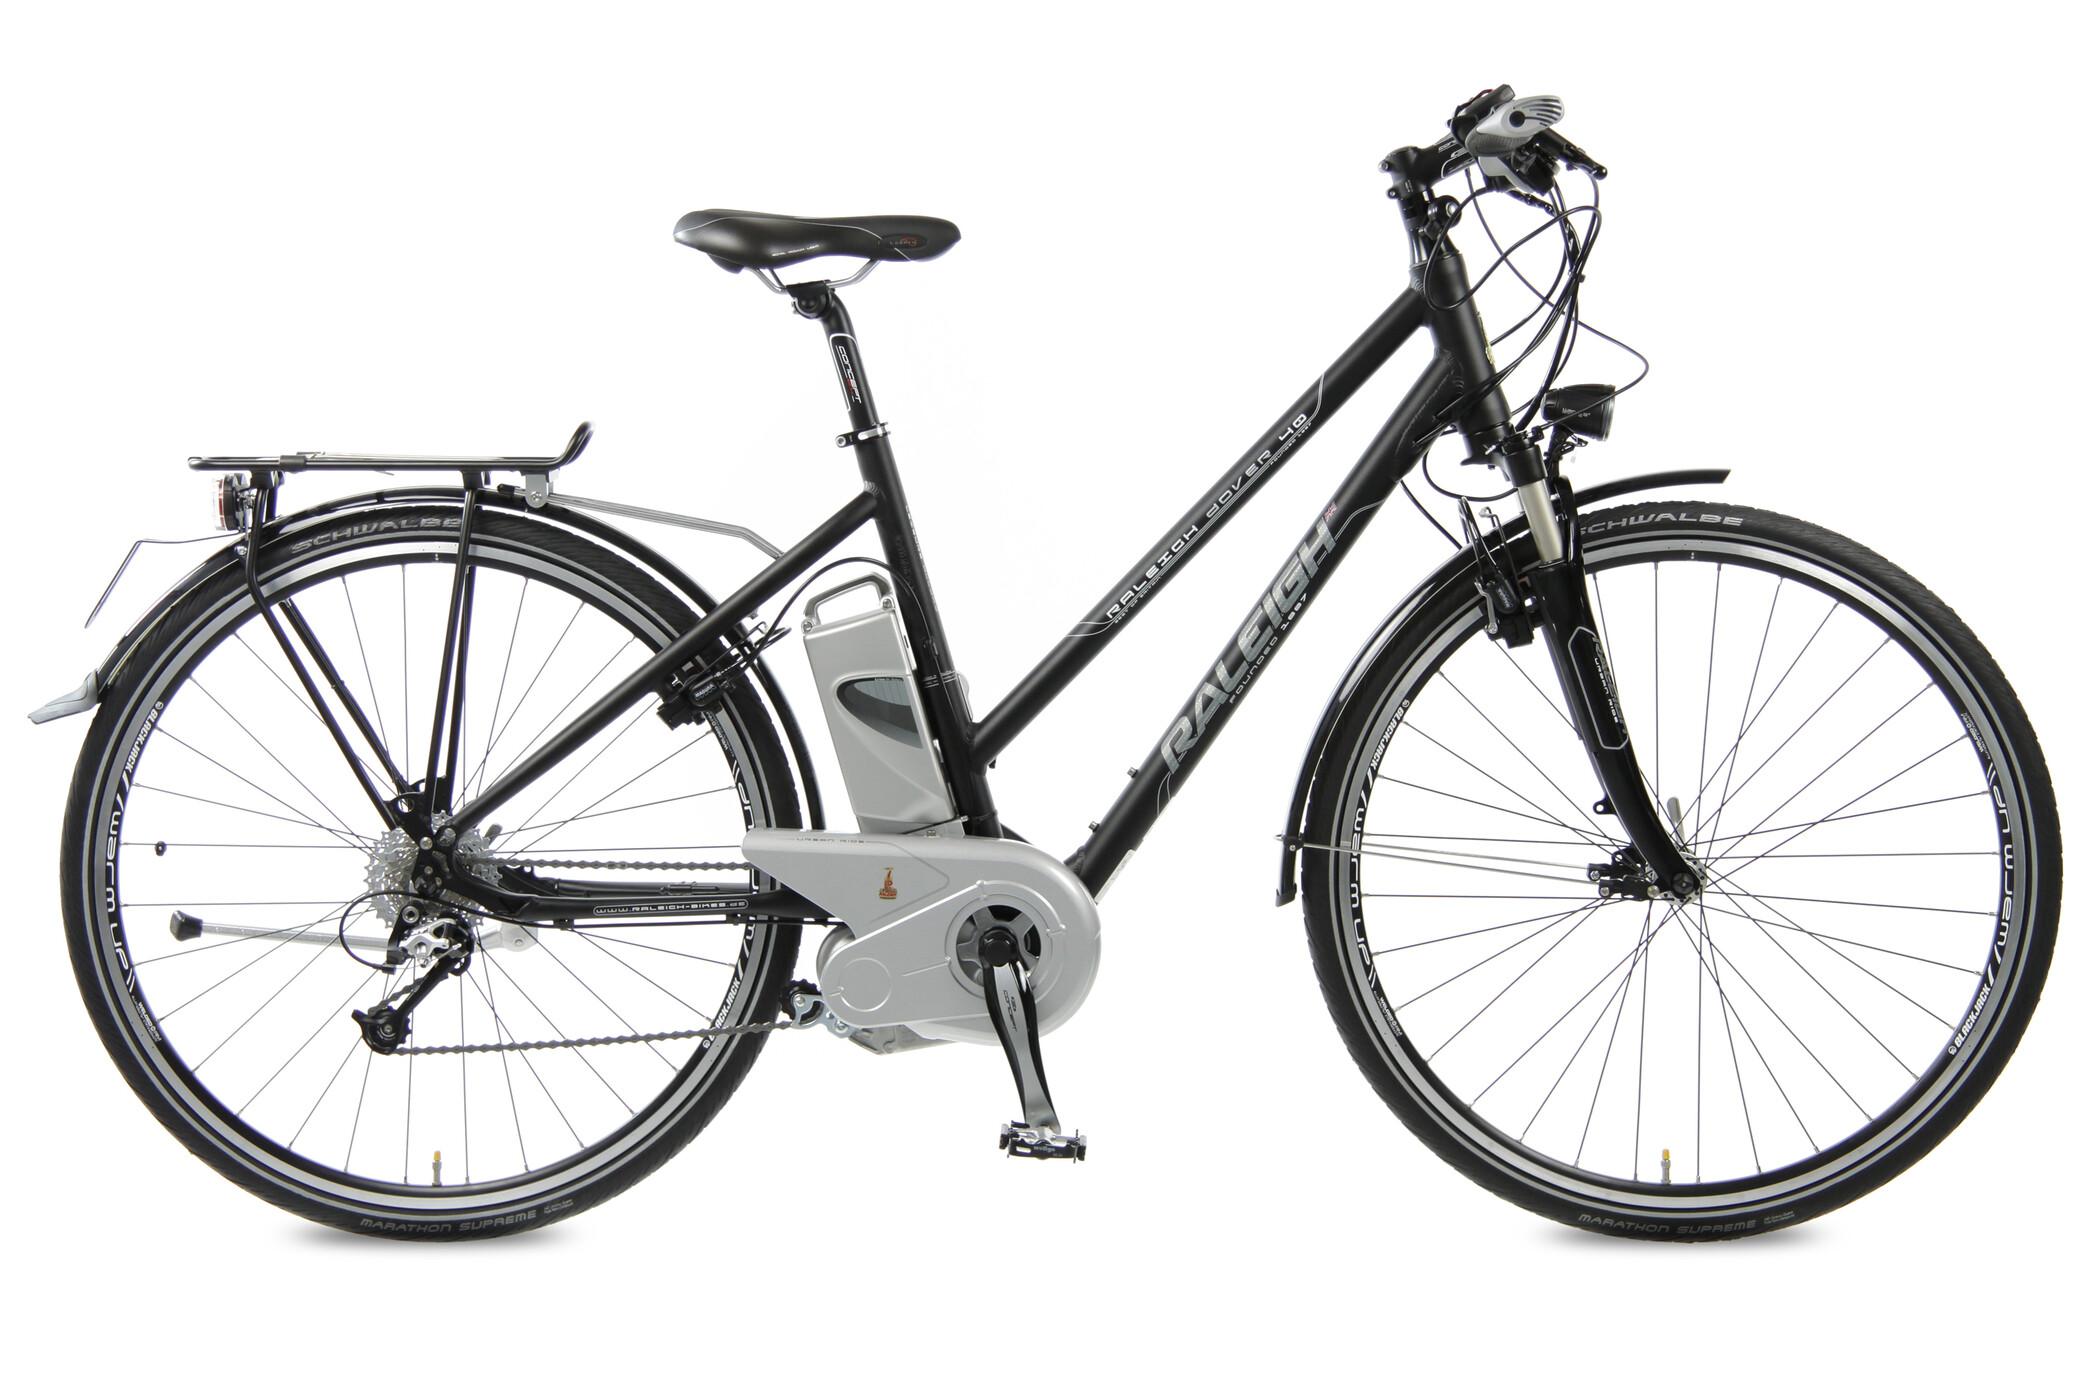 raleigh dover 40 damen magicblack matt sport e bike g nstig kaufen. Black Bedroom Furniture Sets. Home Design Ideas